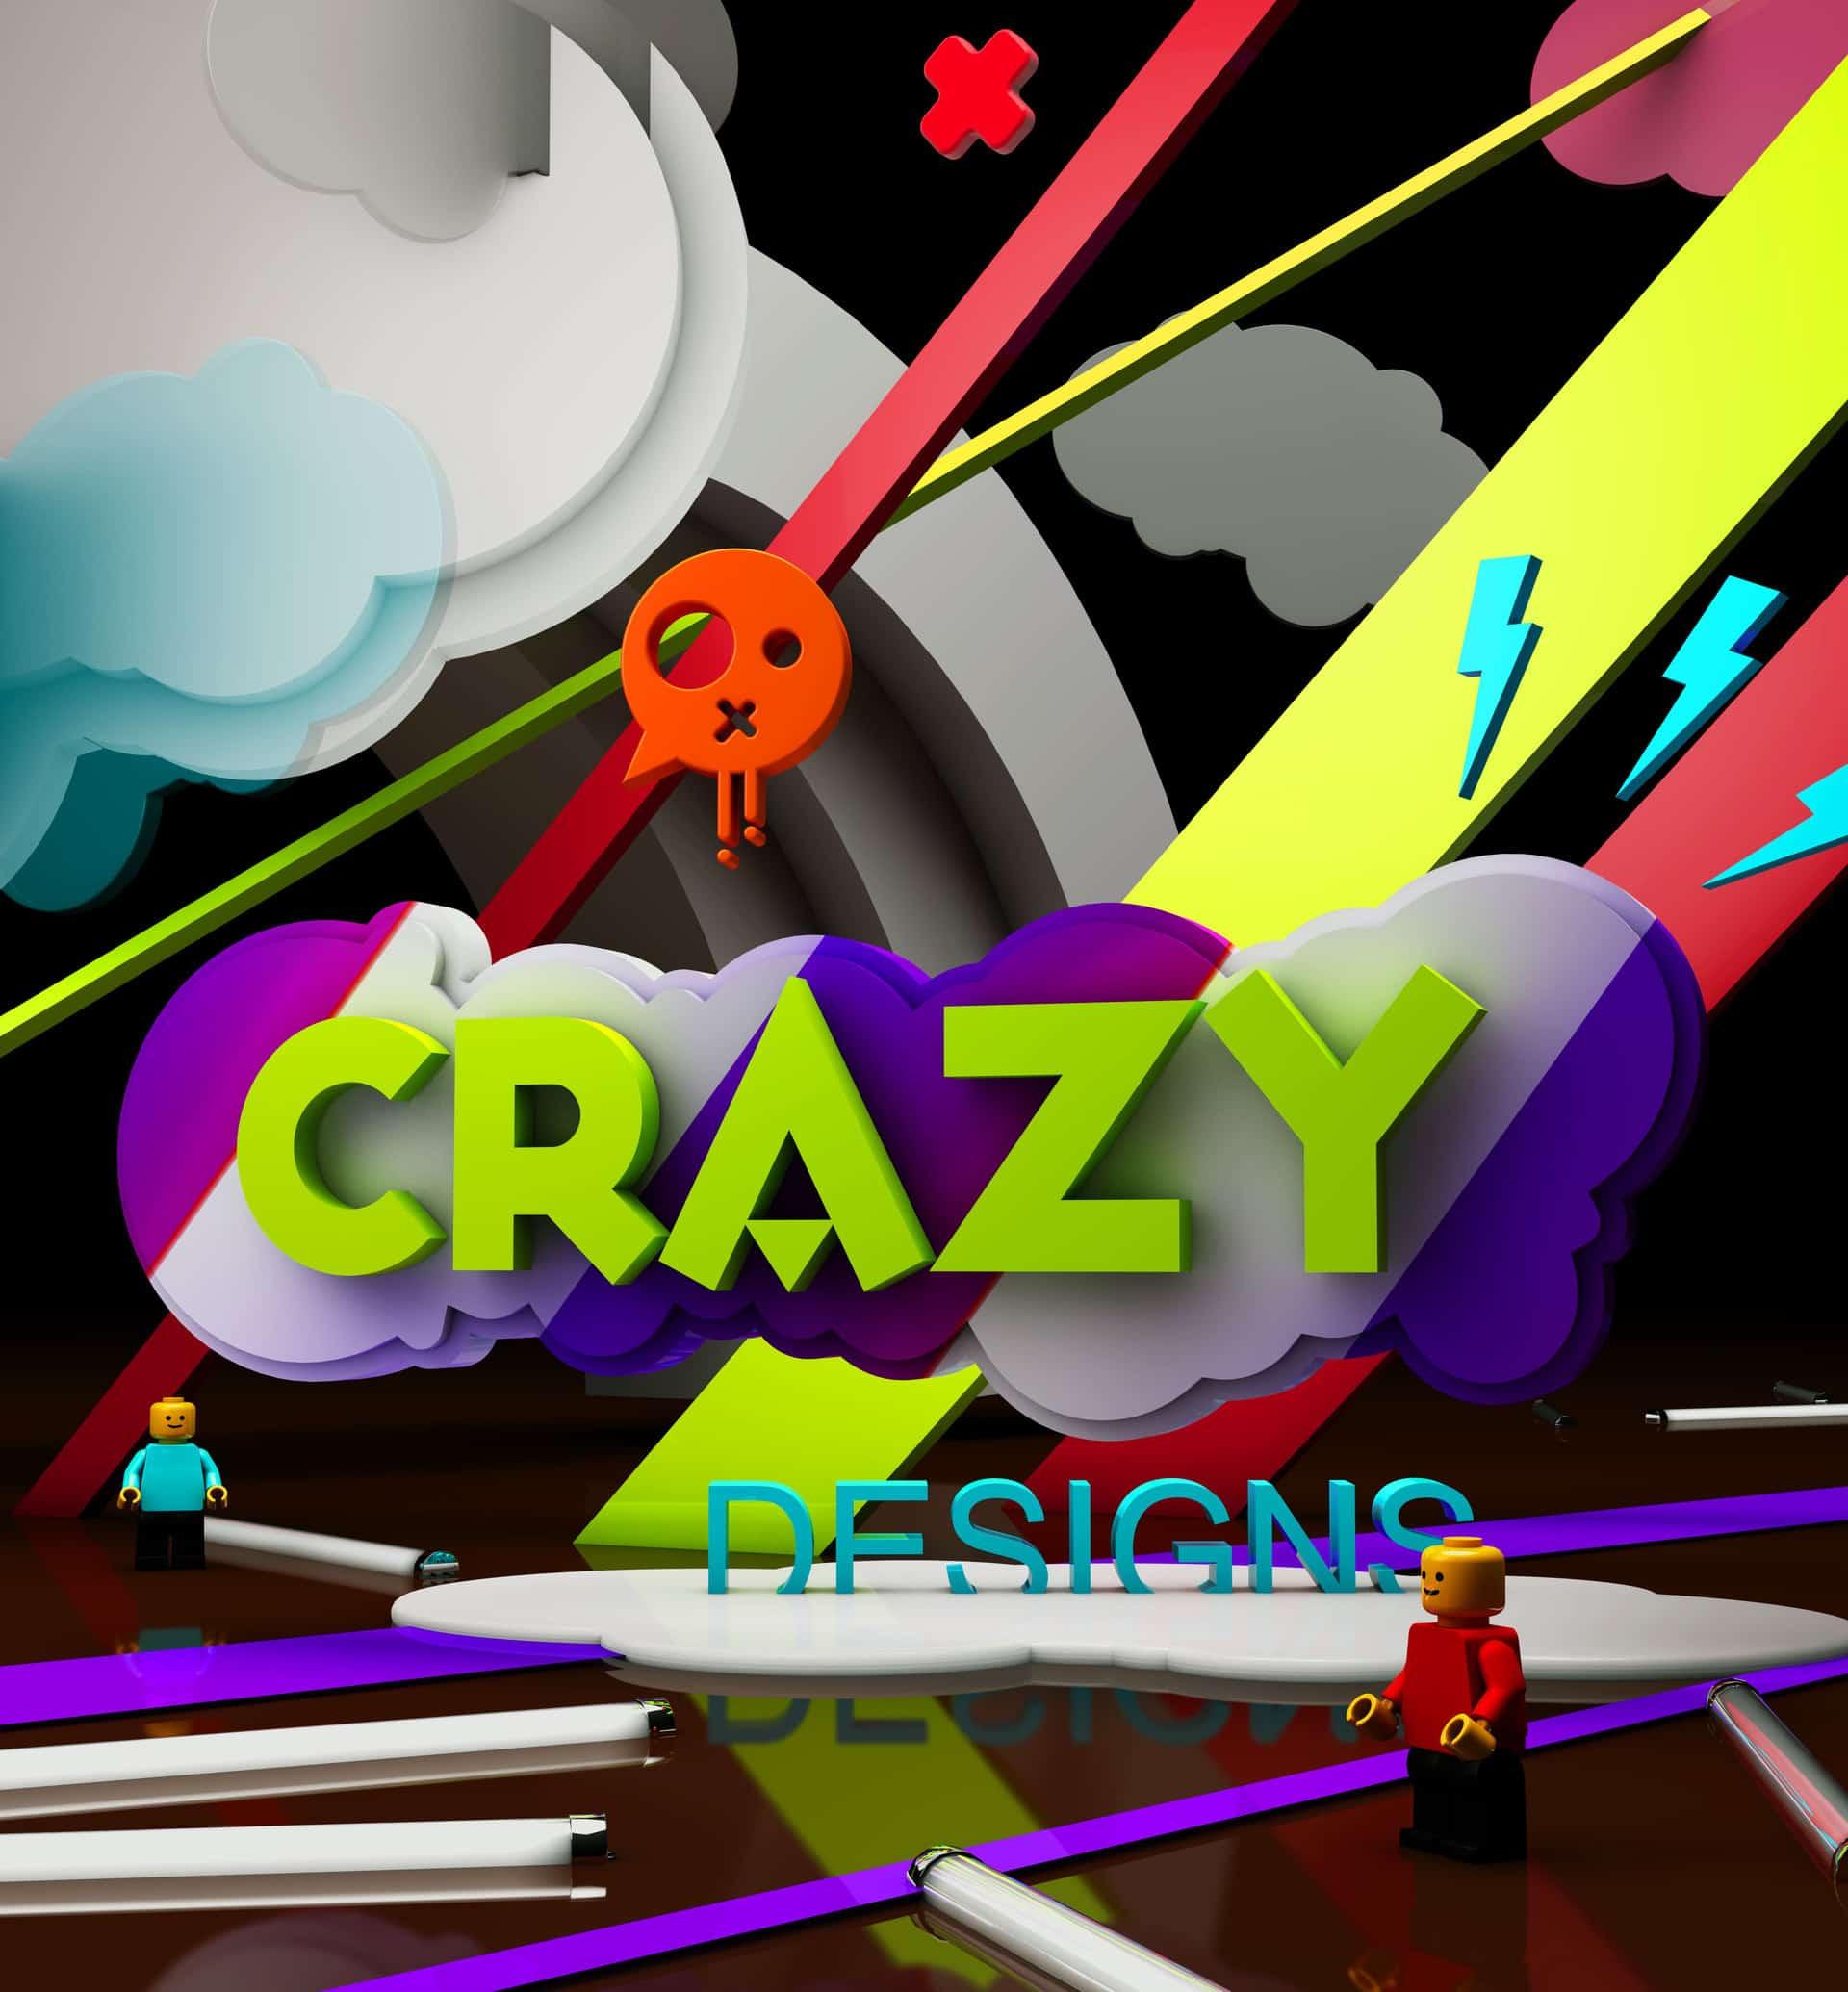 crazy-poster2_wallpaper